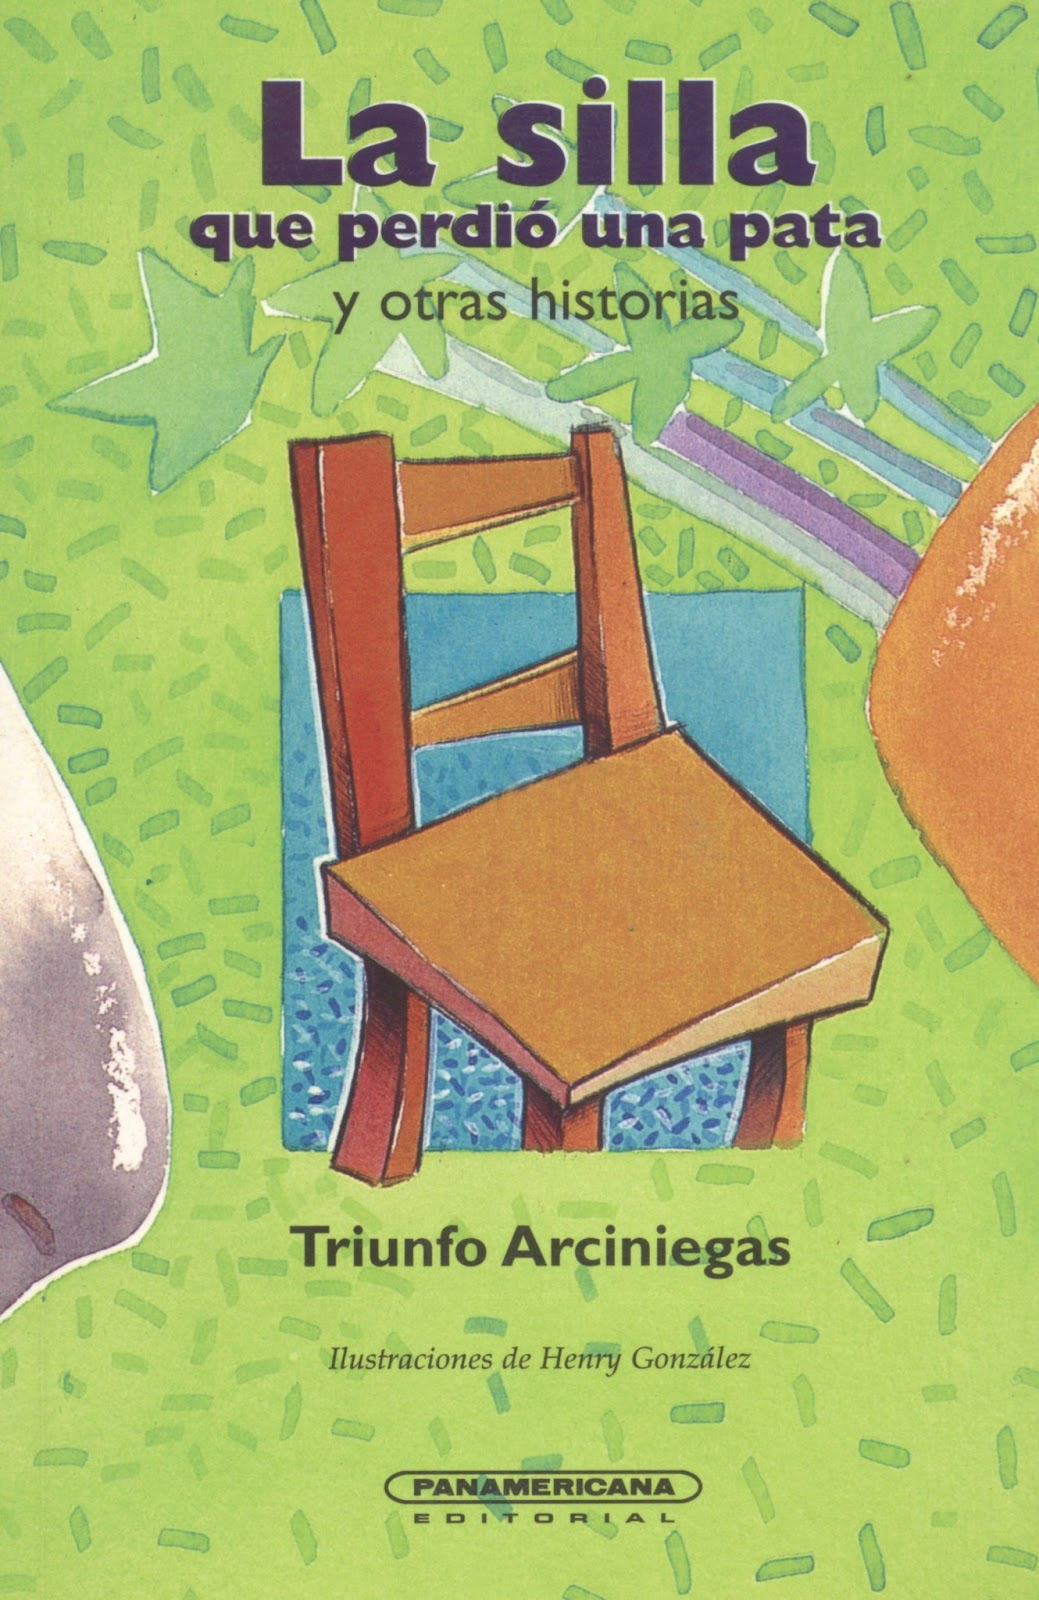 BIOGRAFAS Triunfo Arciniegas